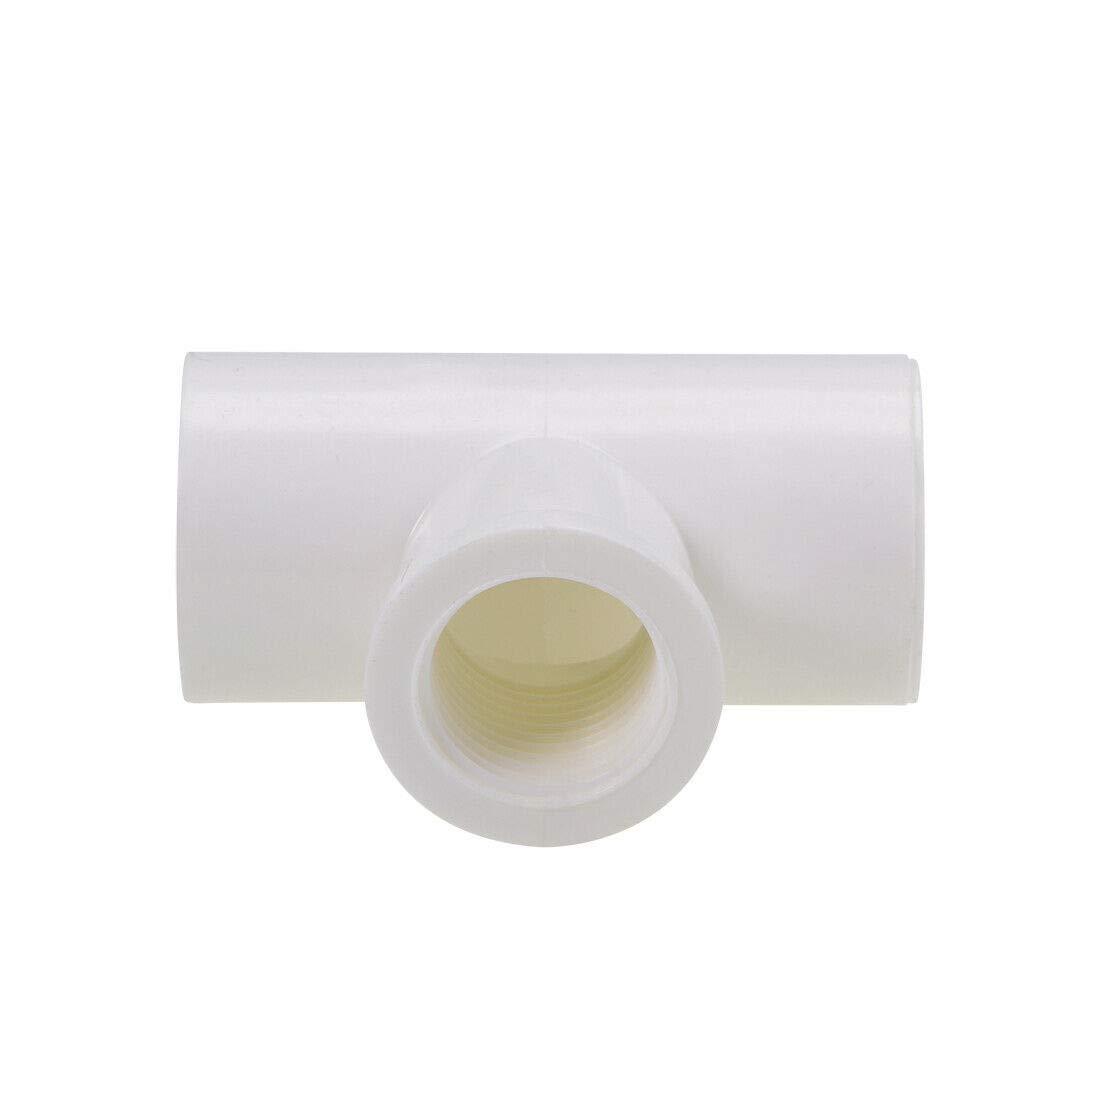 Pipe Fittings 25mm x G1//2 Female x 25mm Slip PVC Pipe Fitting Tee T-Shaped 4Pcs